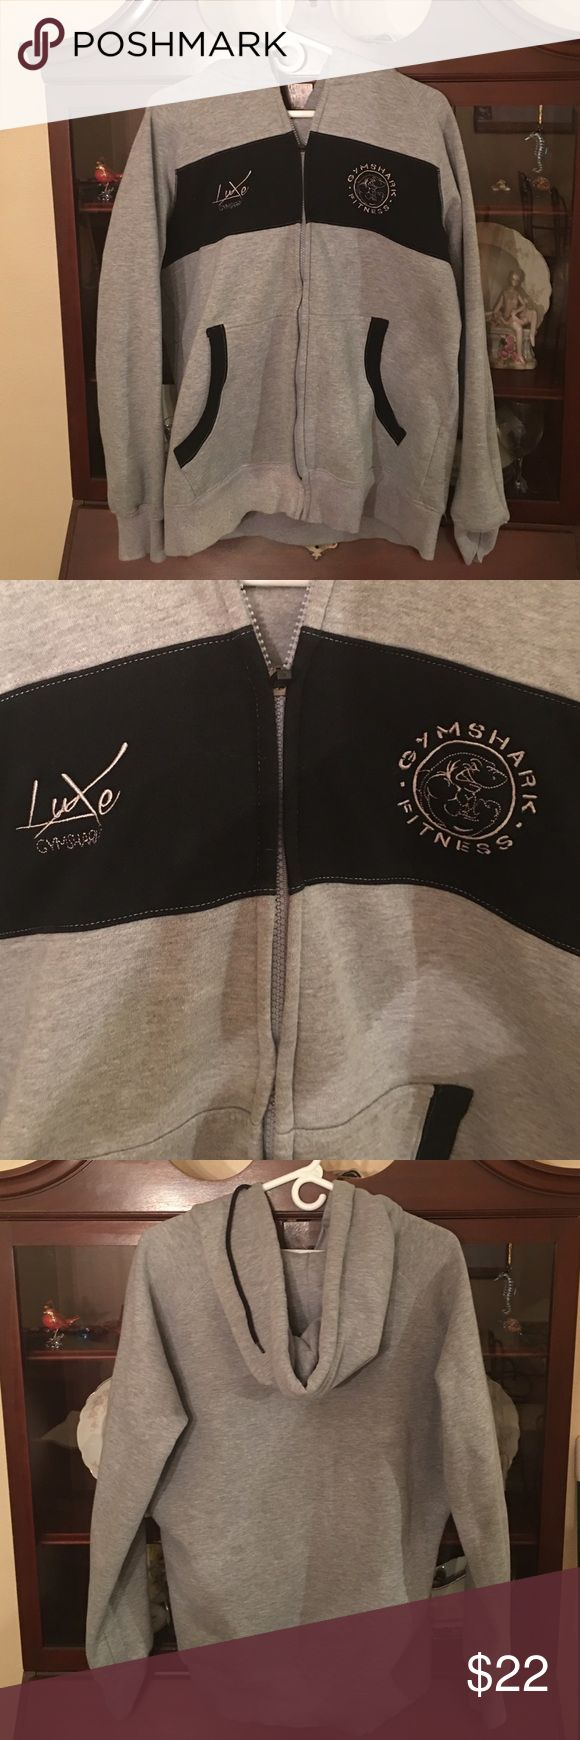 Men's XL hoodie Gymshark XL men's hoodie. Gymshark Fitness. Excellent condition. Zip up front with pockets. Grey and black Gymshark Shirts Sweatshirts & Hoodies